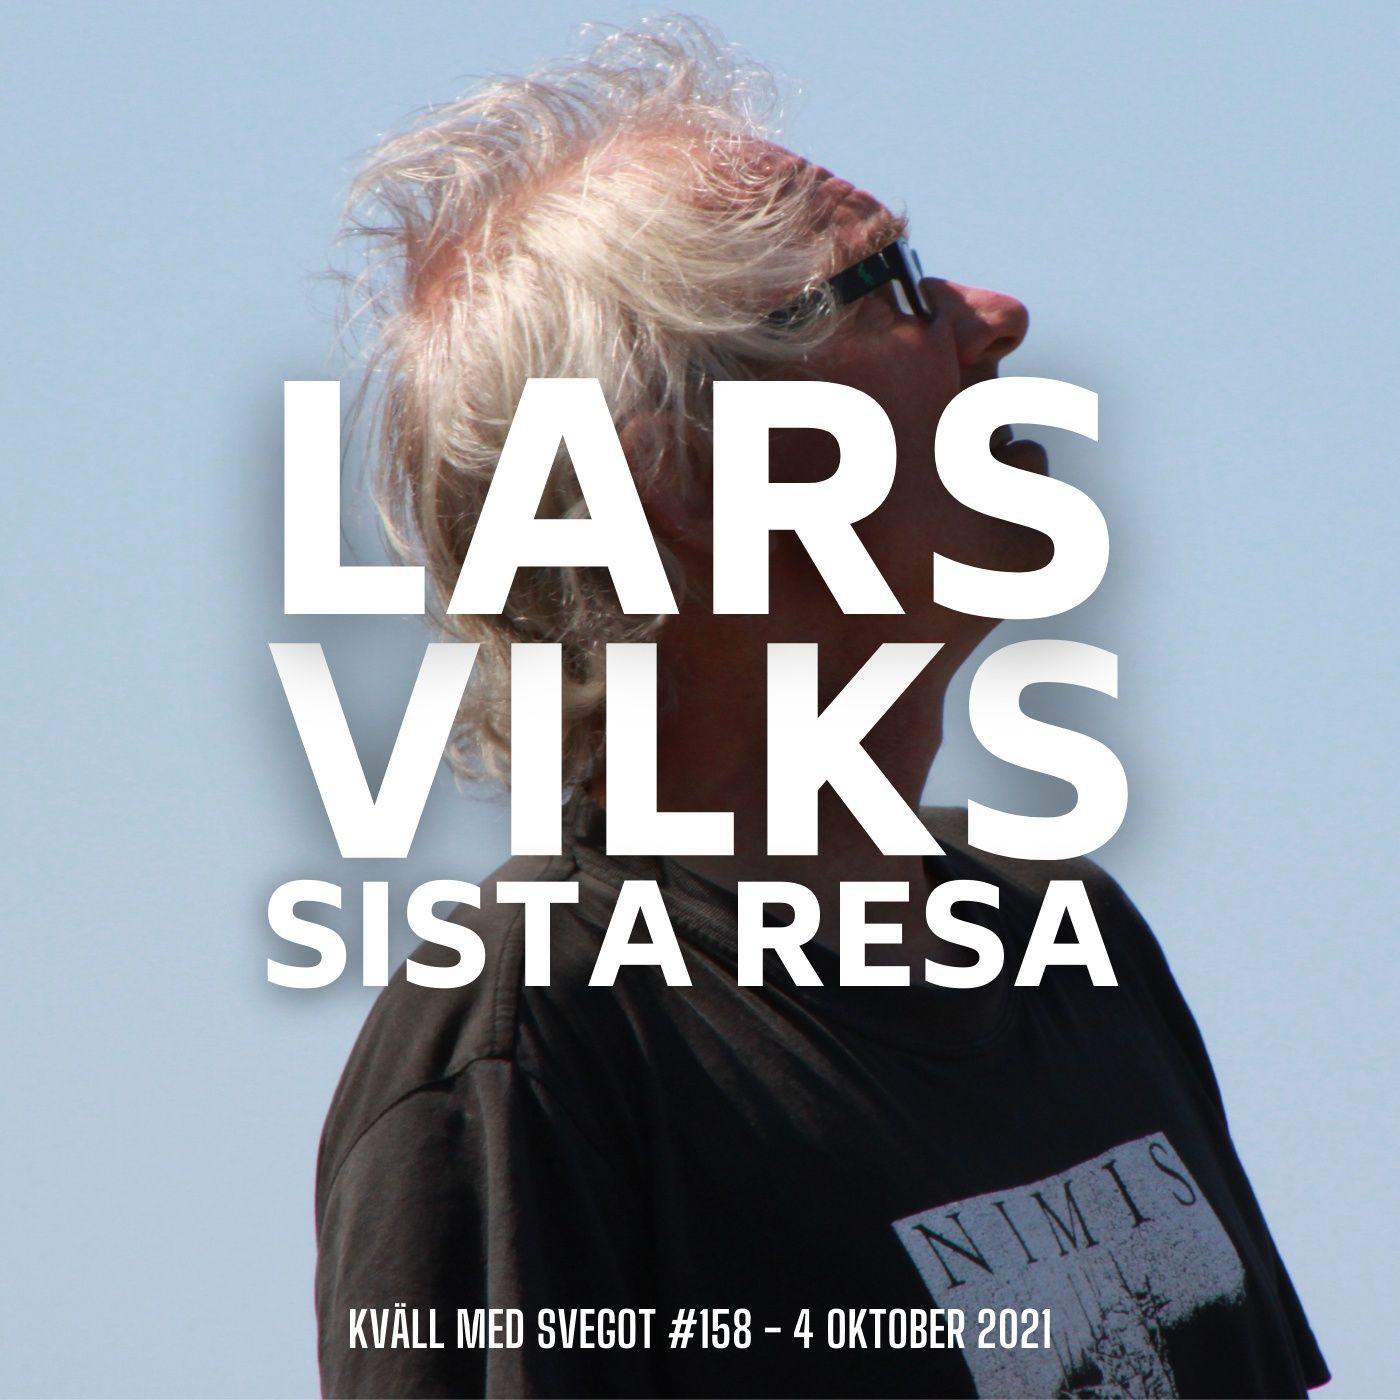 158. Lars Vilks sista resa